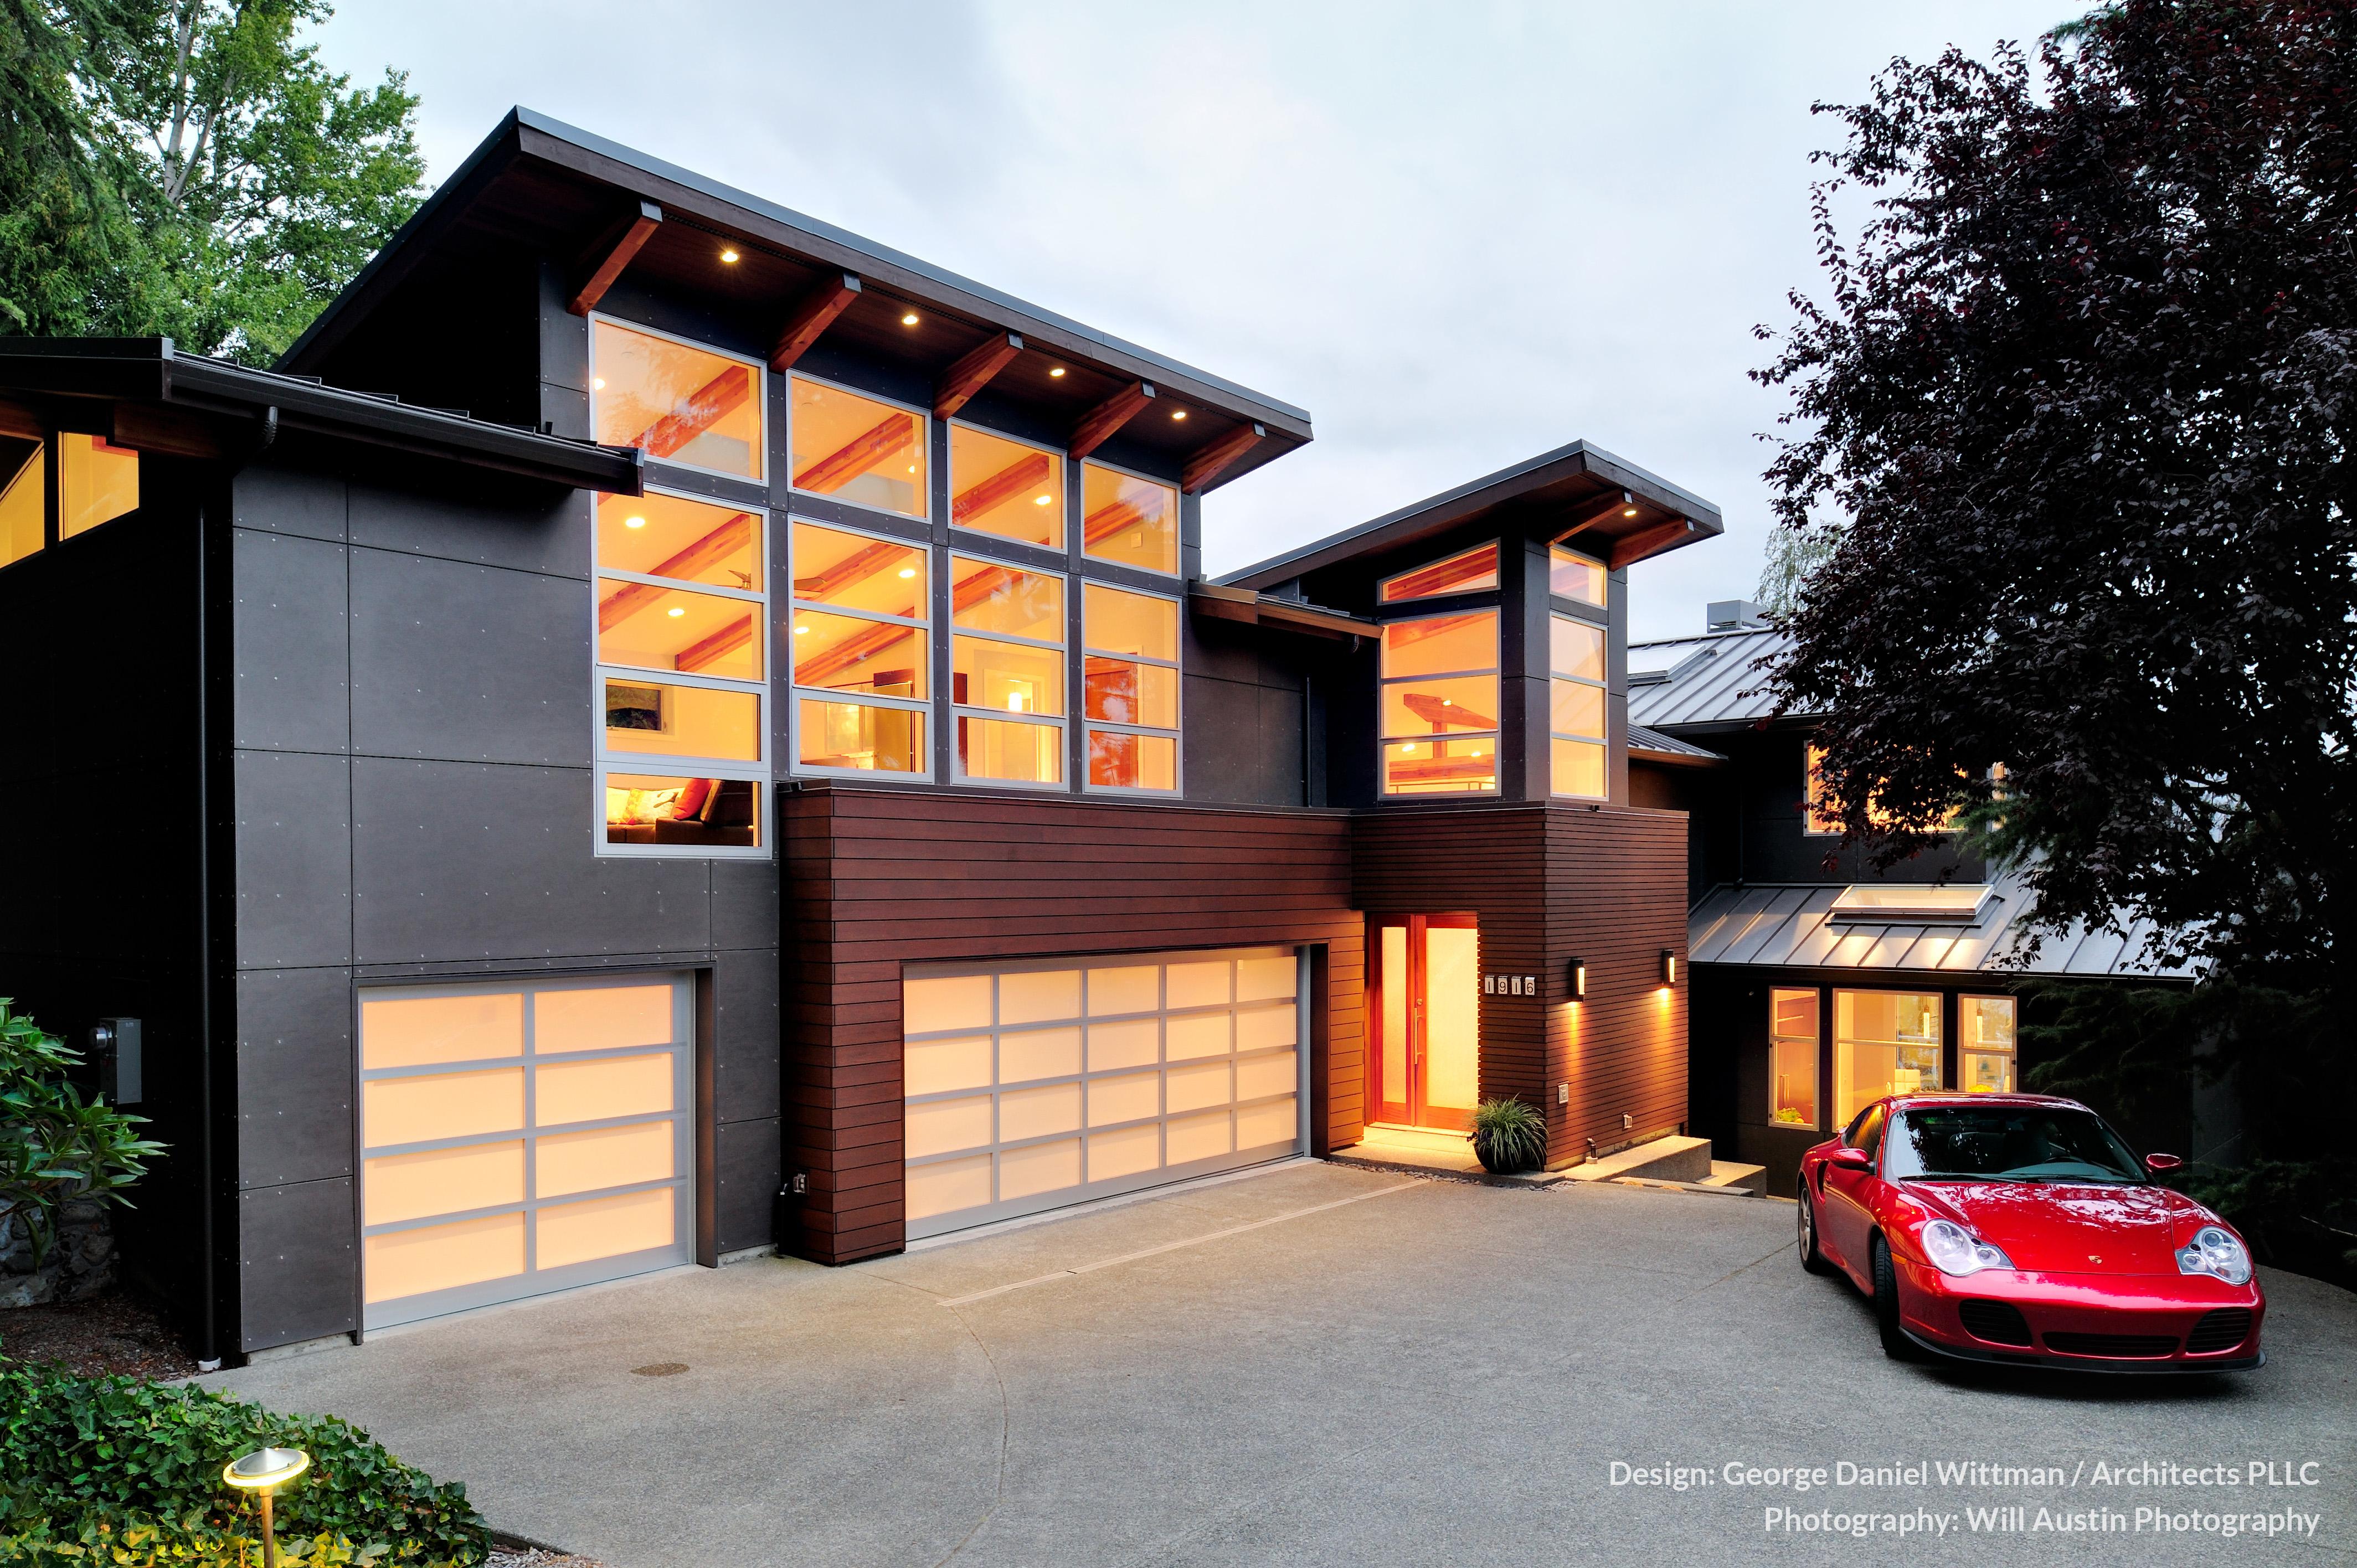 Stunning Waterfront Mercer Island Residence By George Daniel Wittman Architects